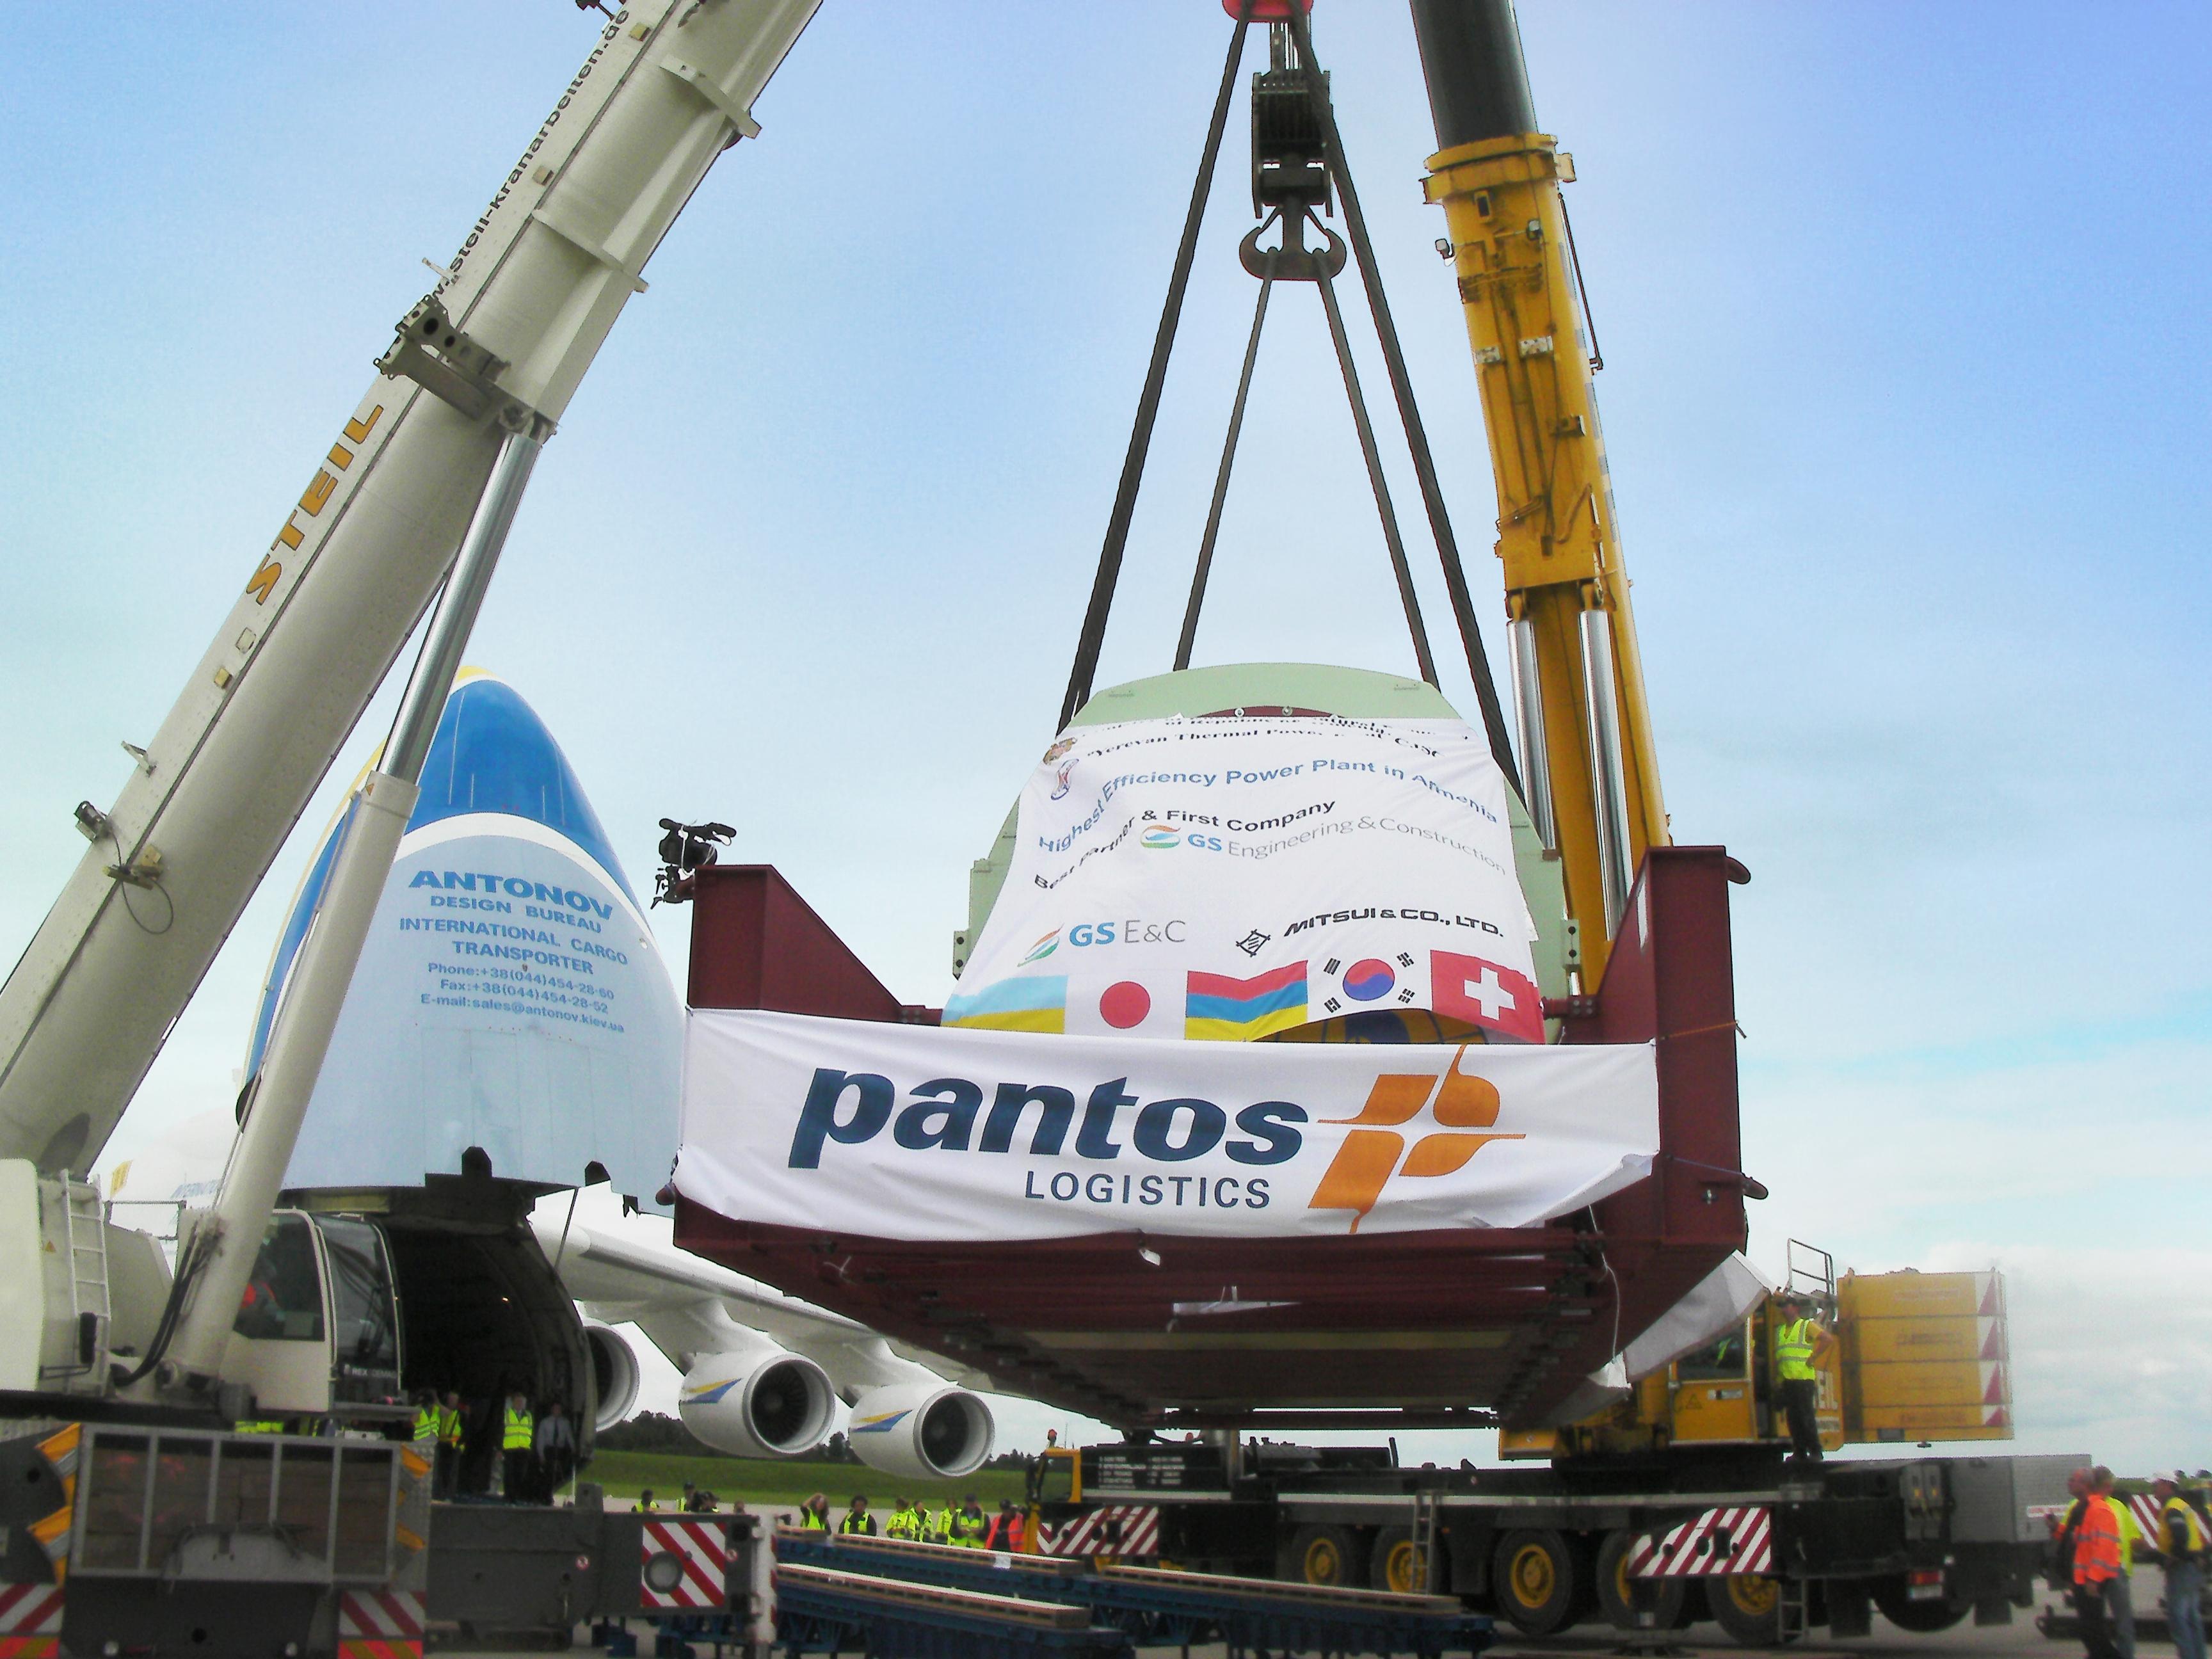 File:Pantos Logistics - Air cargo jpg - Wikimedia Commons